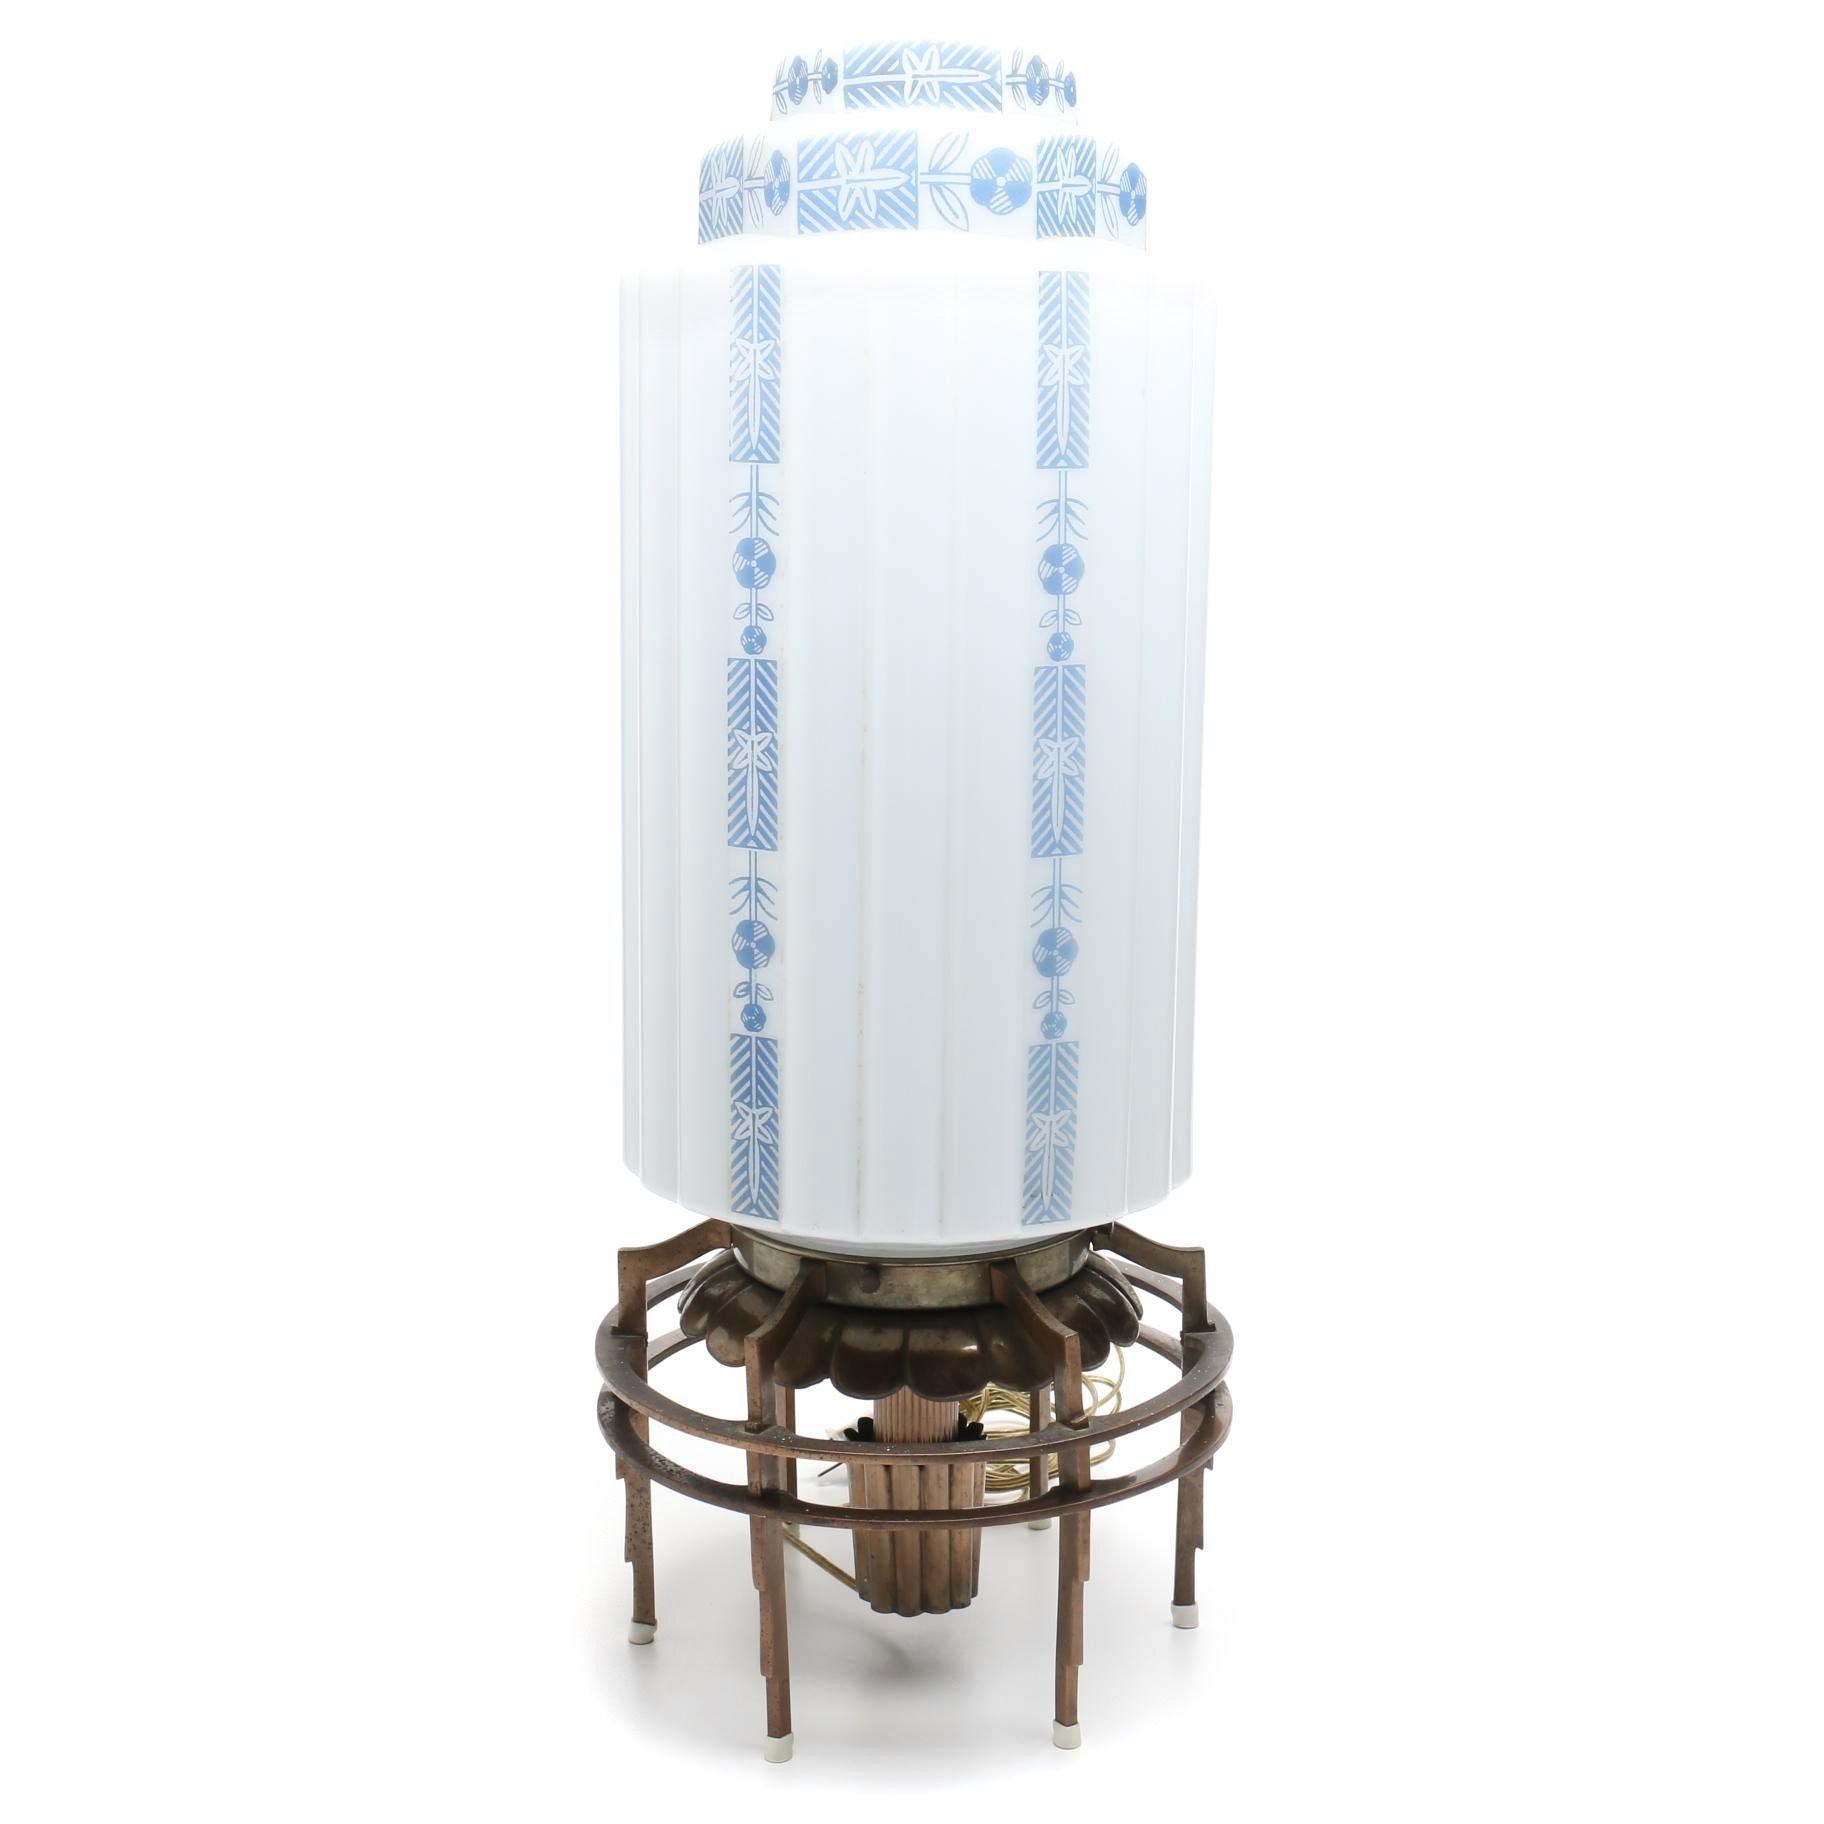 Oscar Bach Art Deco Lamp from Cincinnati Bell Building